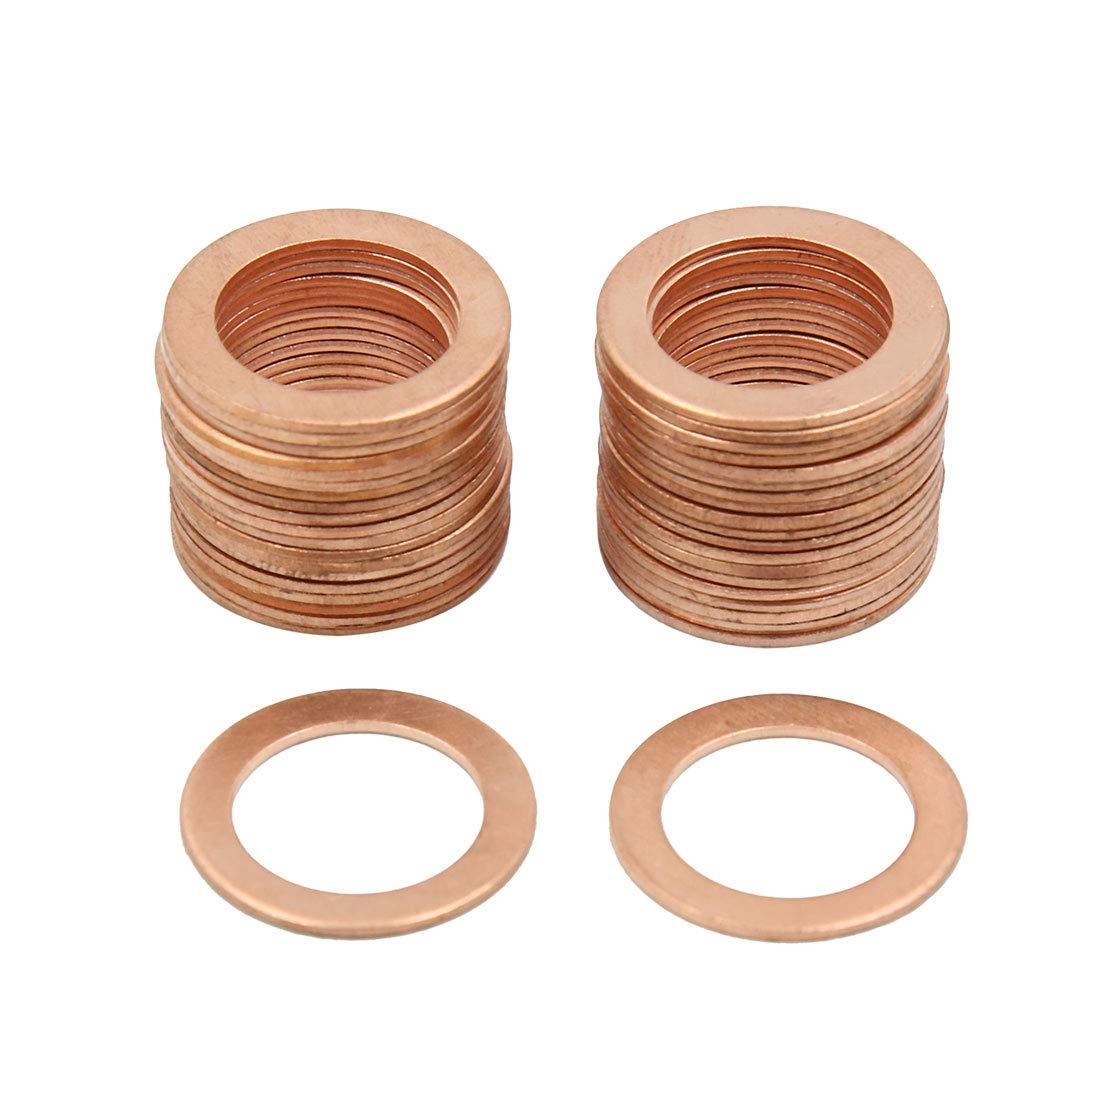 X AUTOHAUX 16mm Inner Dia Copper Crush Washers Flat Car Sealing Gaskets Rings 40pcs